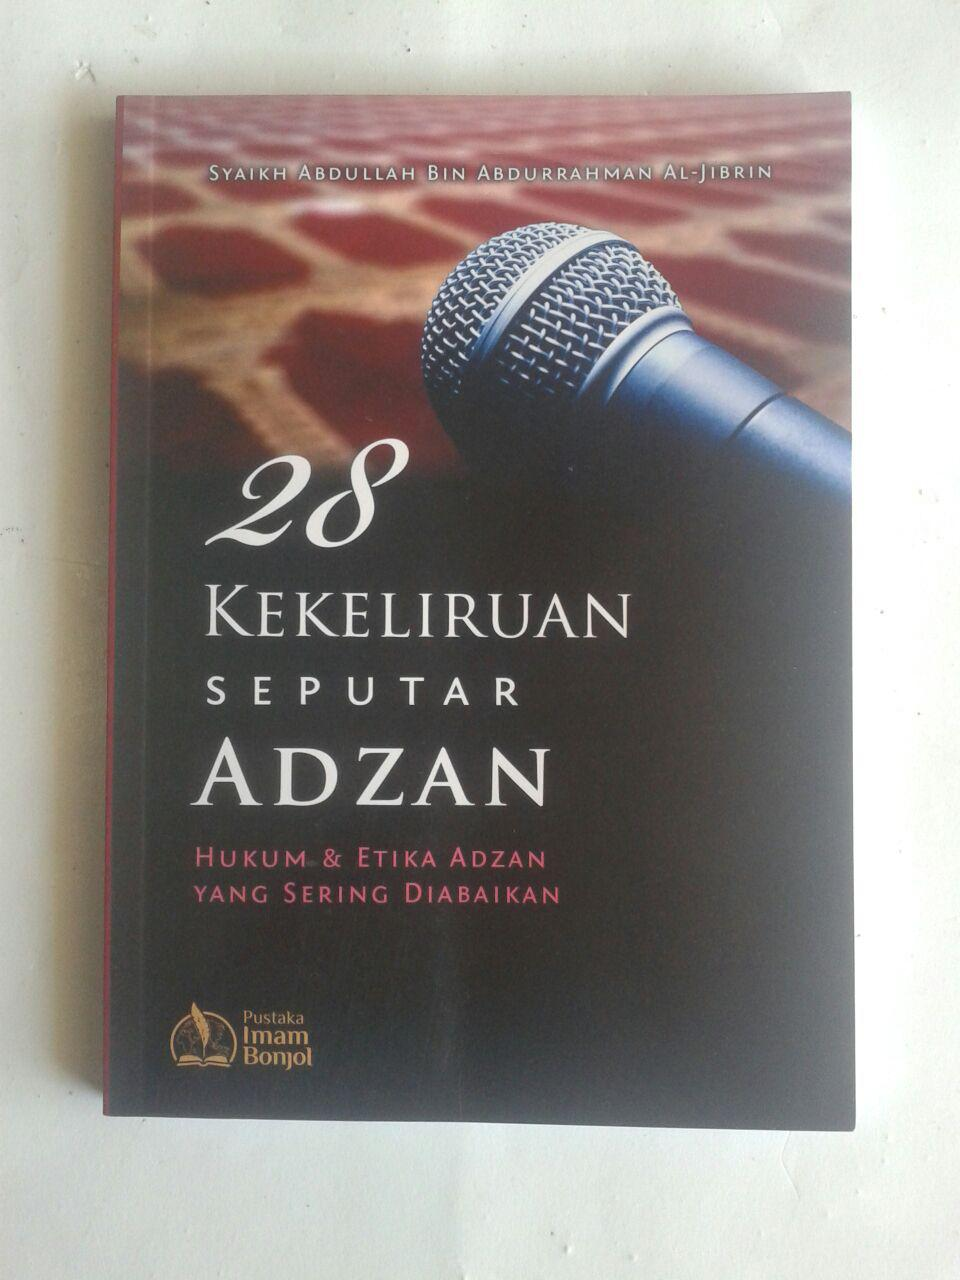 Buku 28 Kekeliruan Seputar Adzan Hukum Dan Etika Adzan cover 2